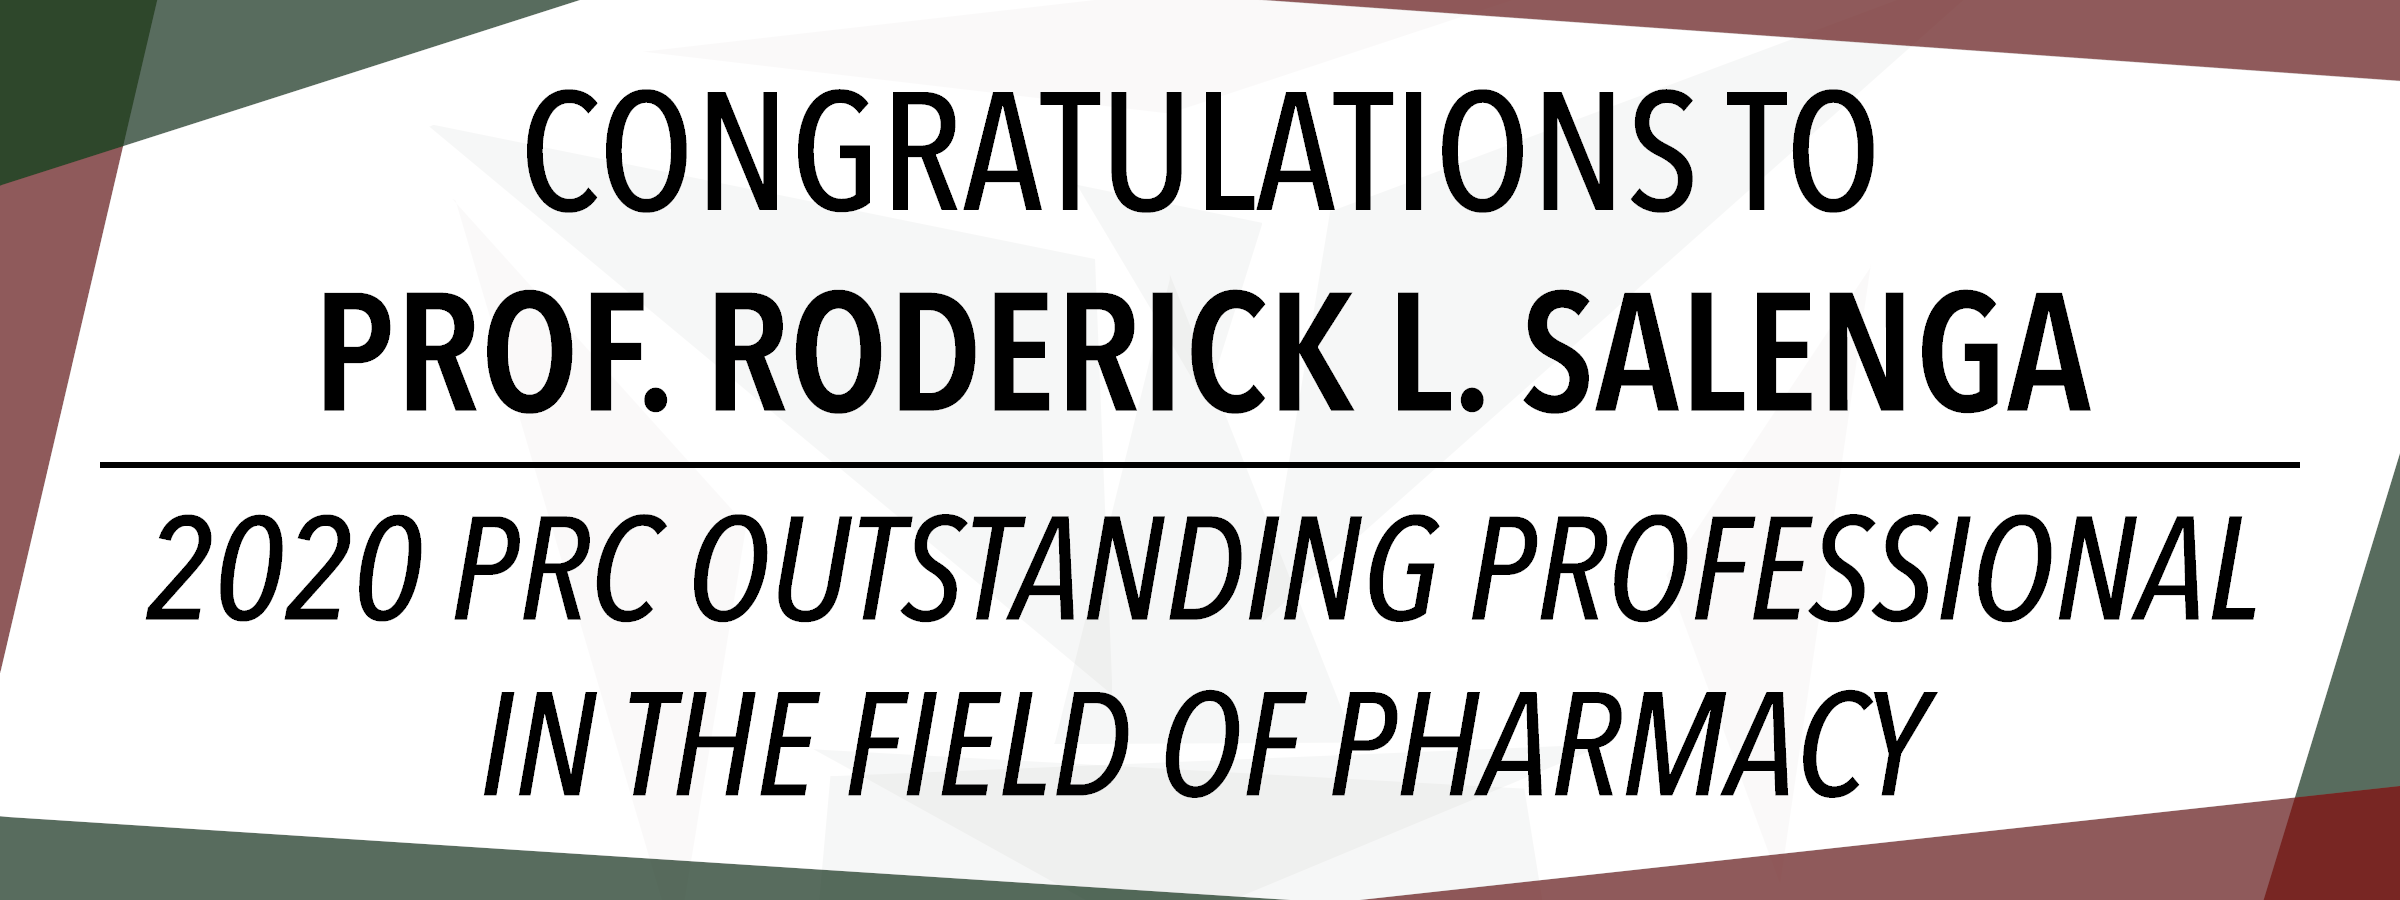 Congratulations To Prof. Eric Salenga!